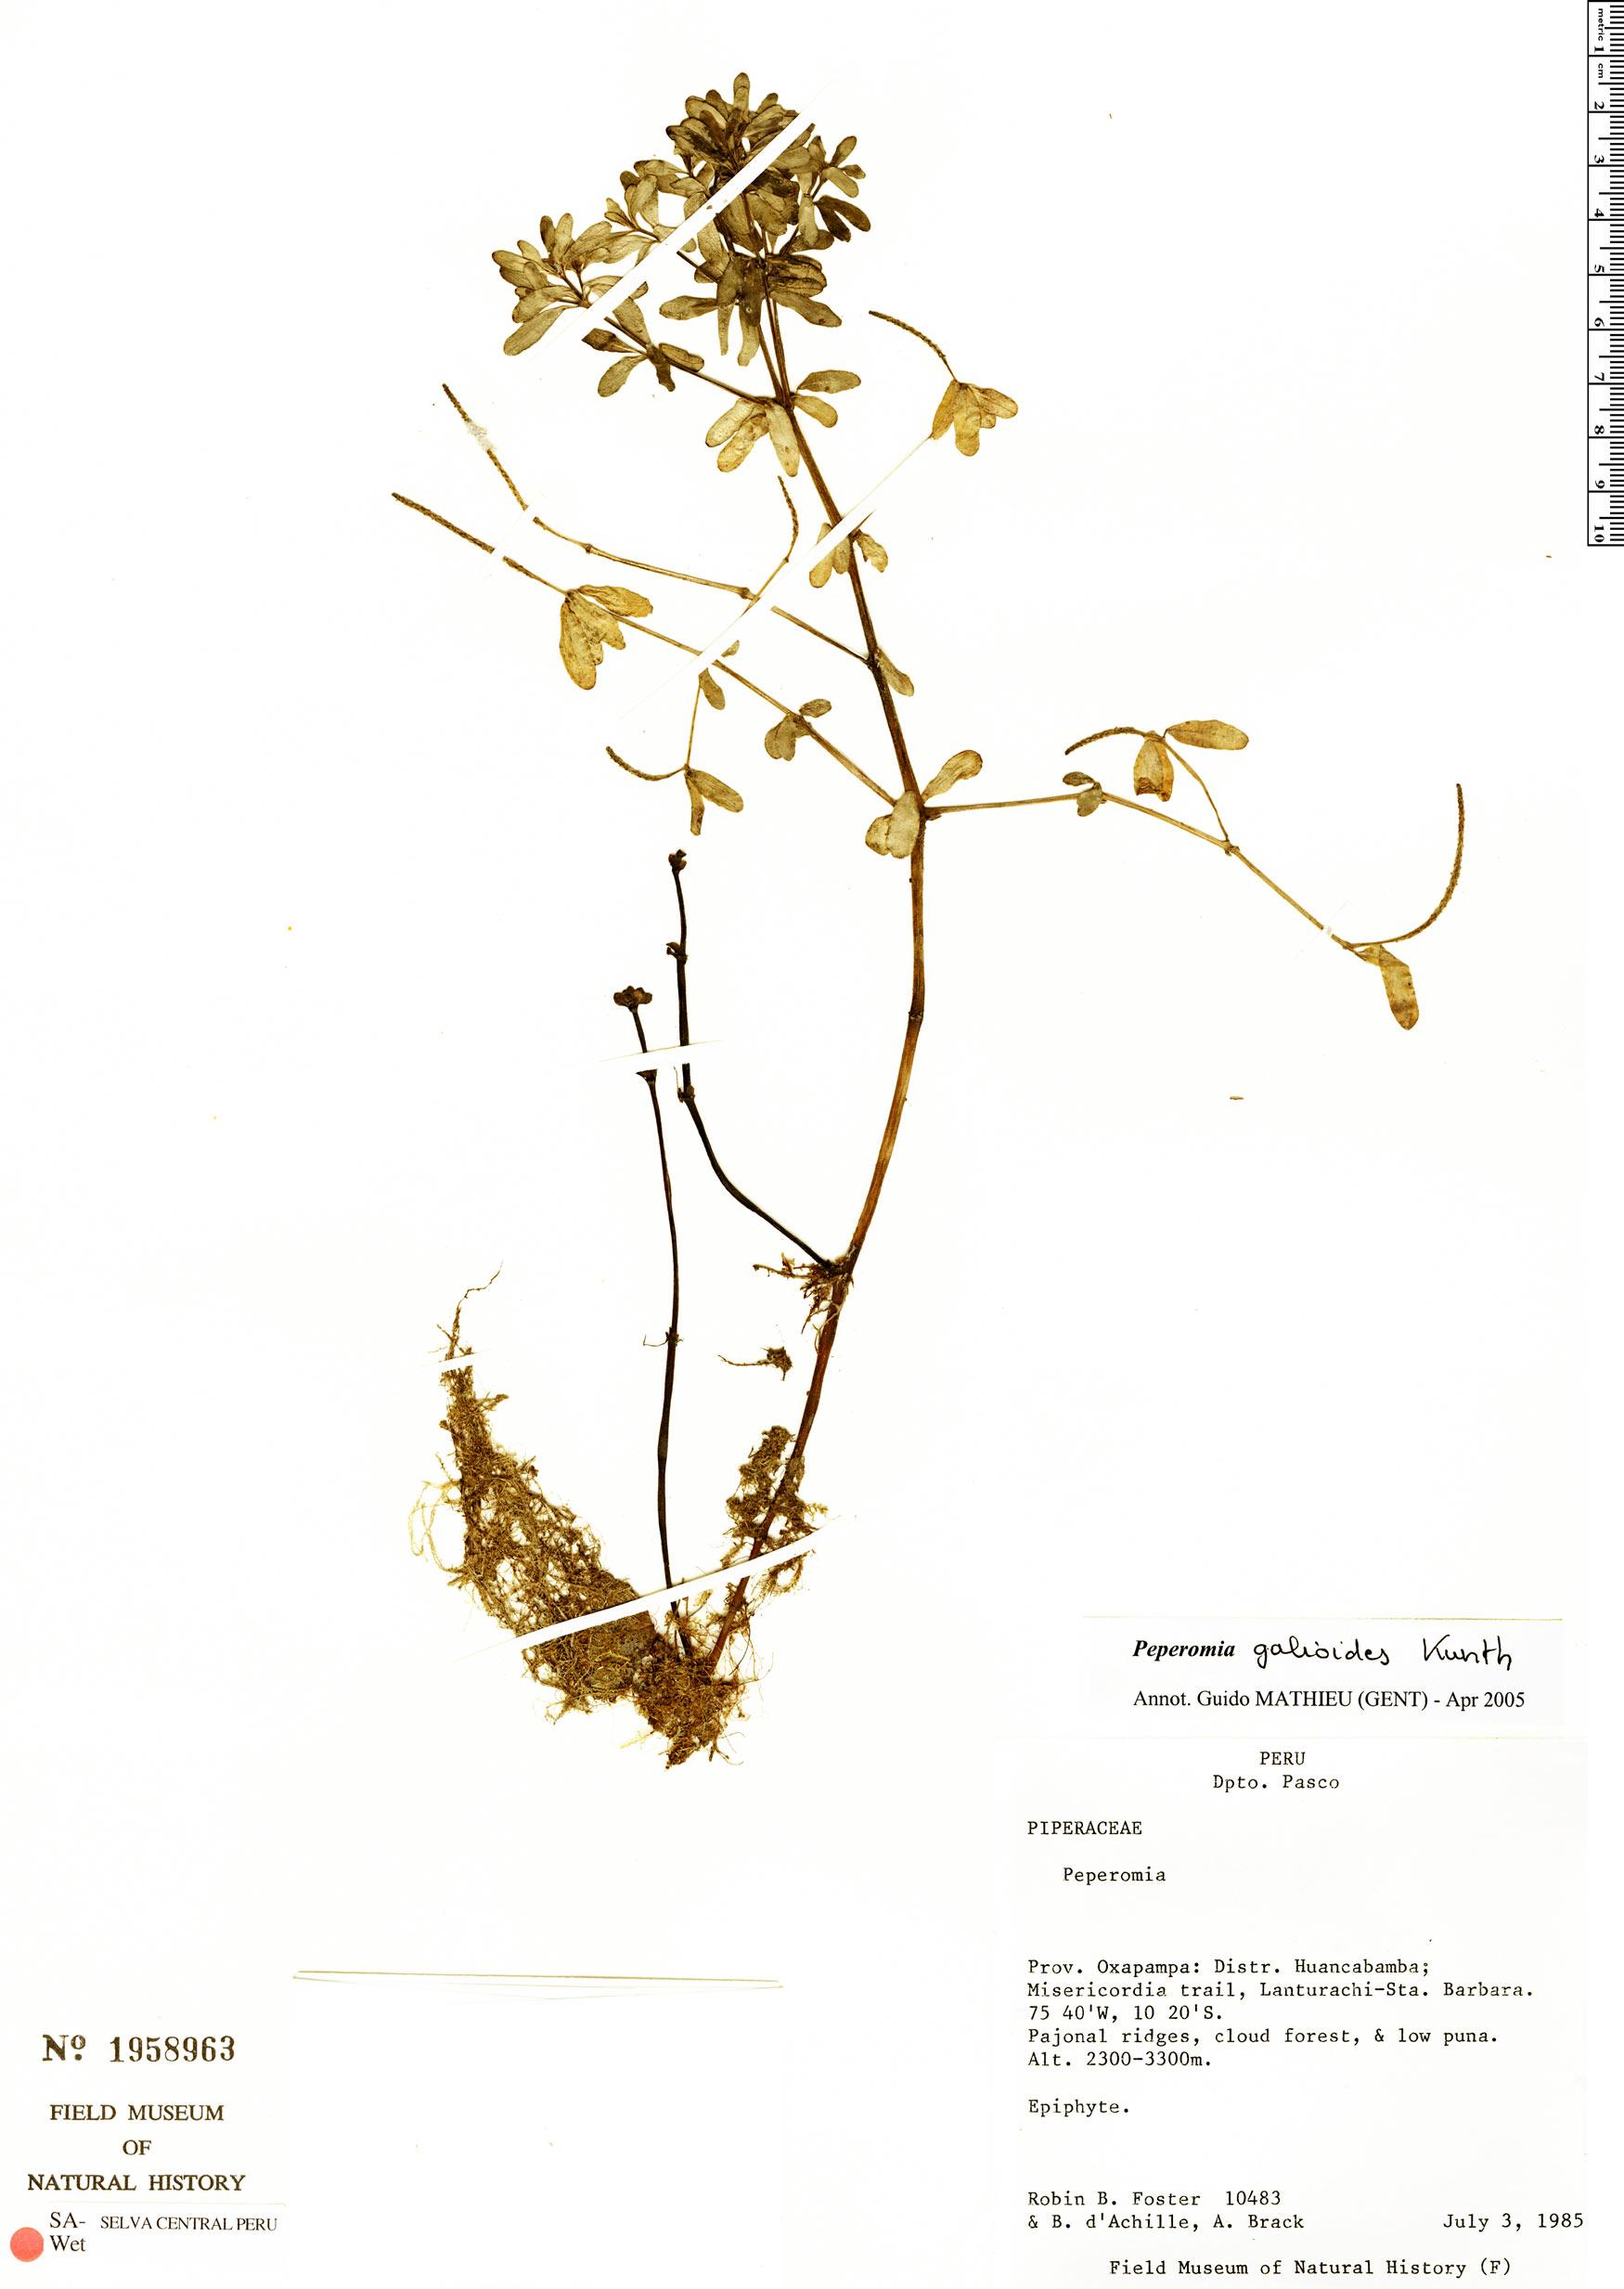 Specimen: Peperomia galioides